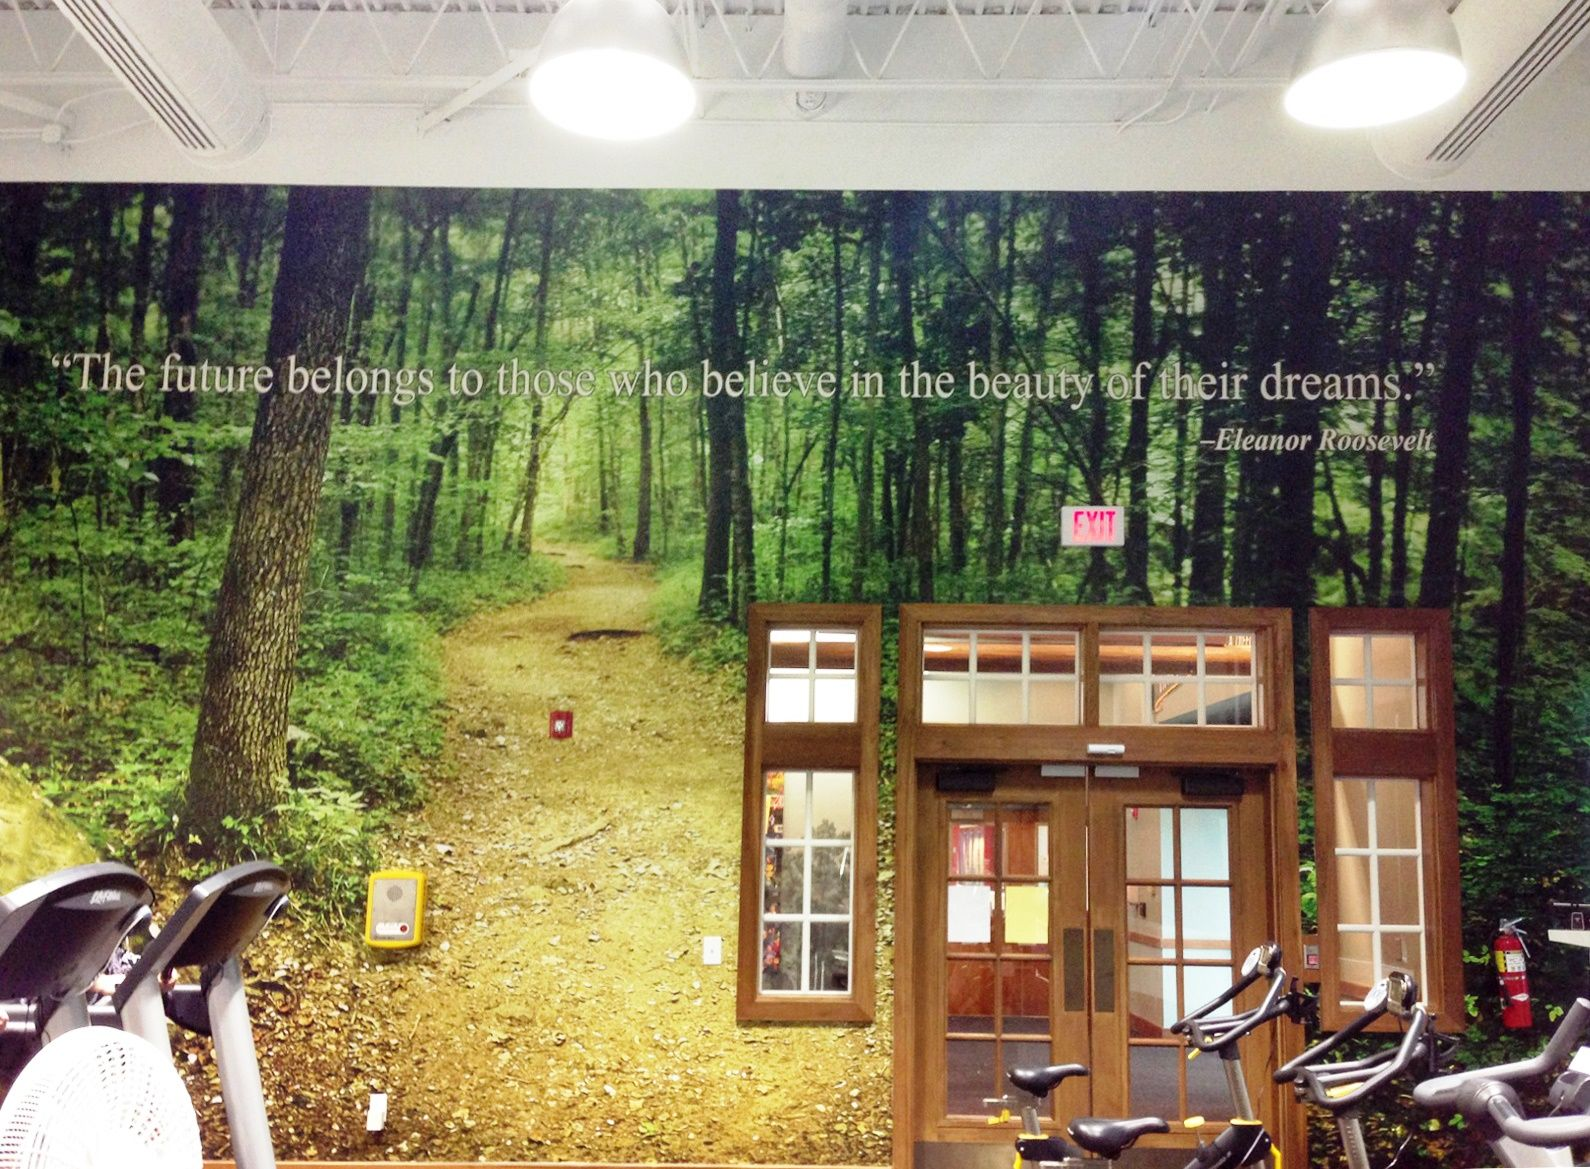 Bass Pro Shop Hq Gym Wall Murals Custom Decor Simple Wall Decor